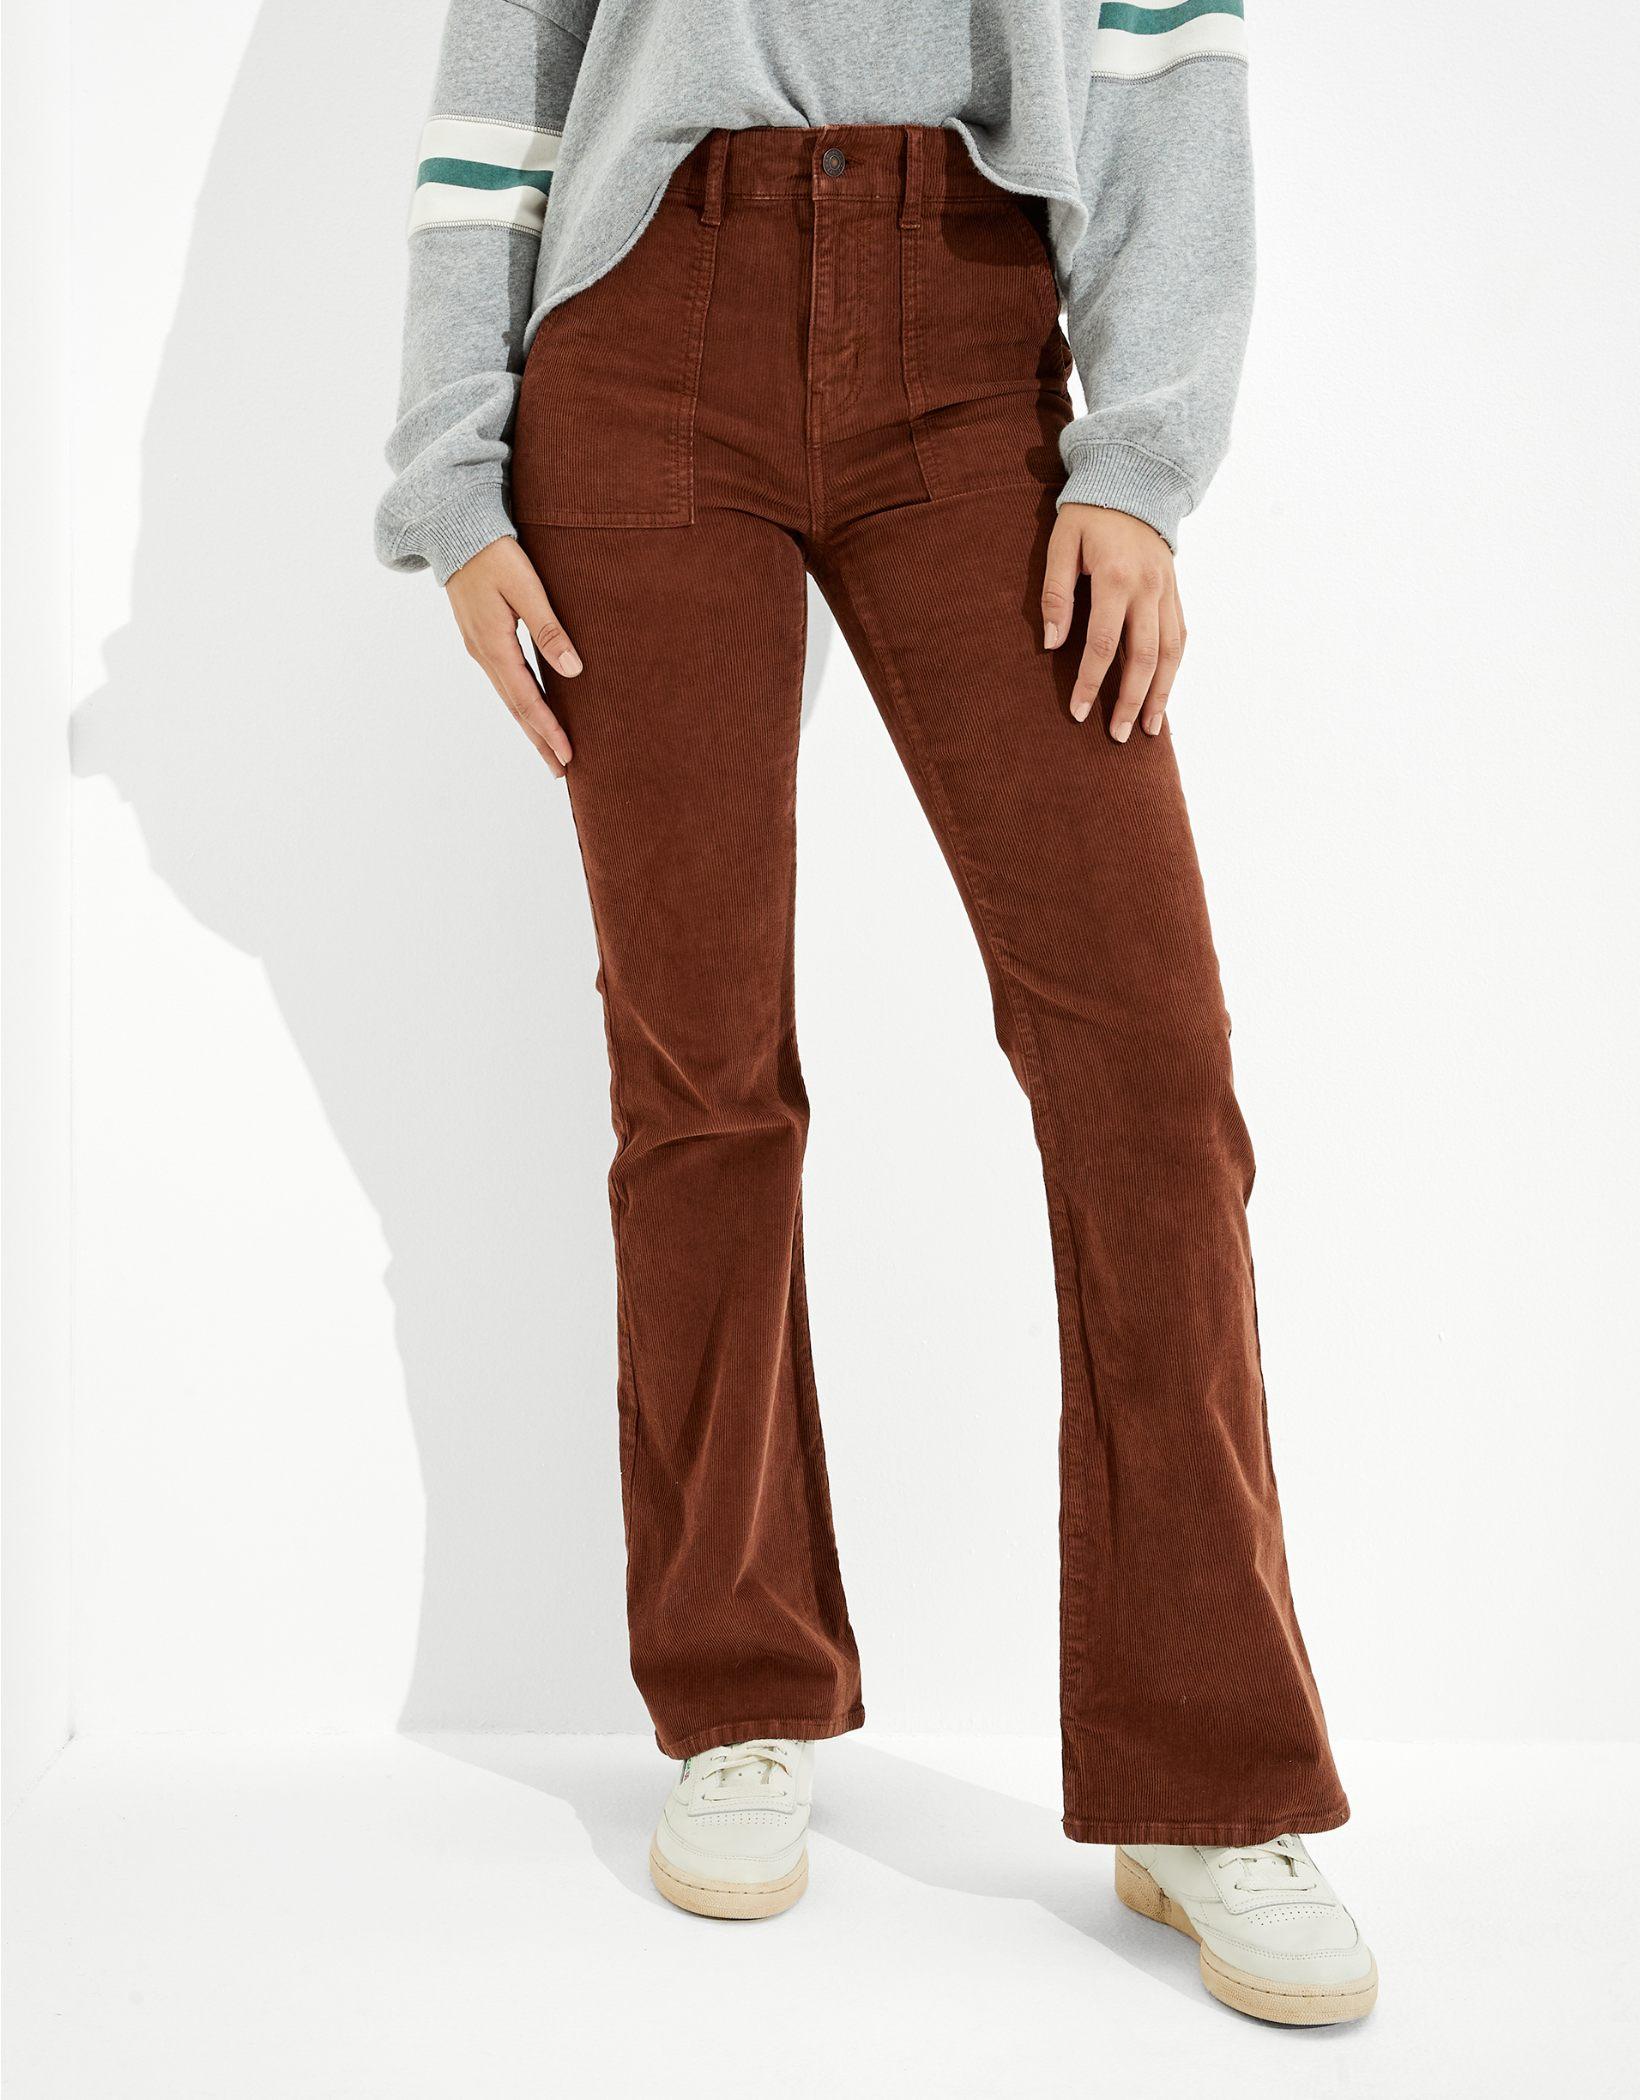 AE Corduroy Super High-Waisted Flare Pant